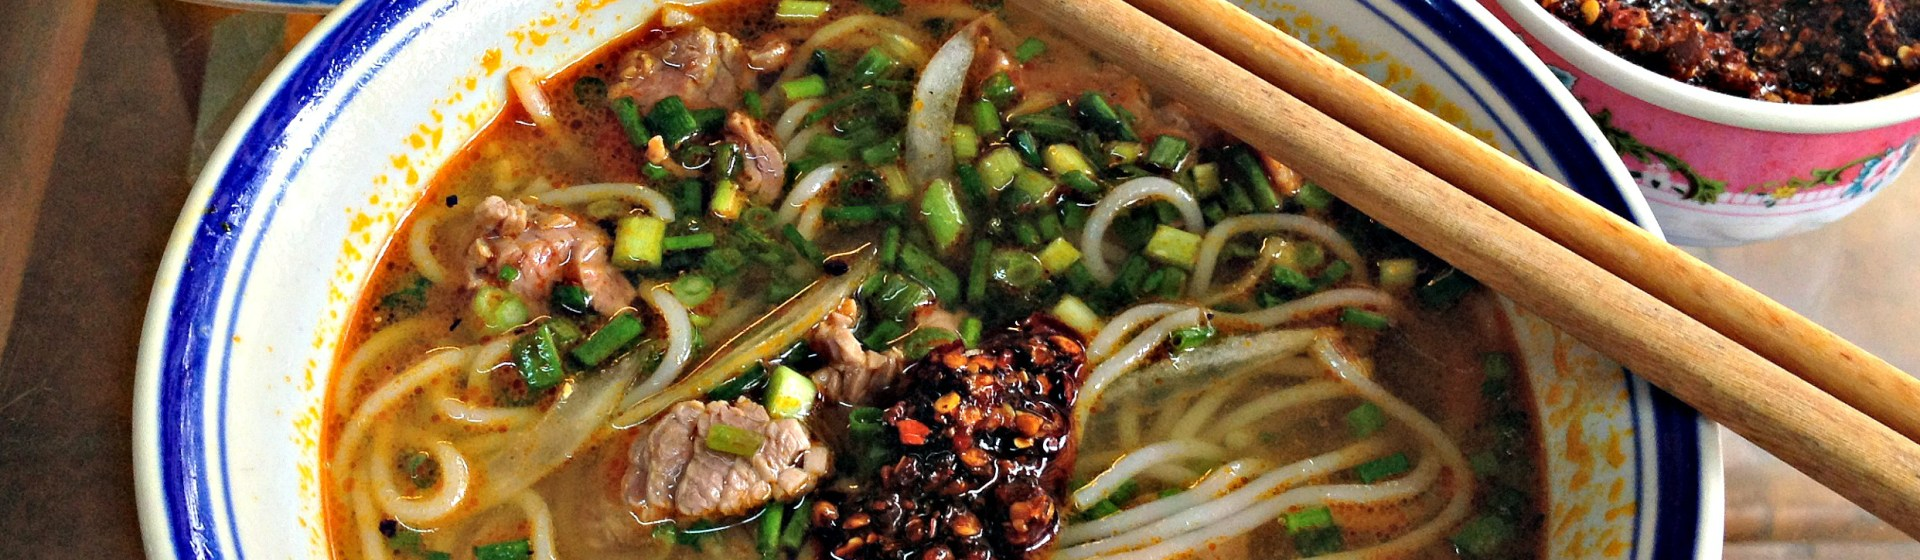 How To Make Bun Bo Hue, Chef Rob Newton Style - Food Republic